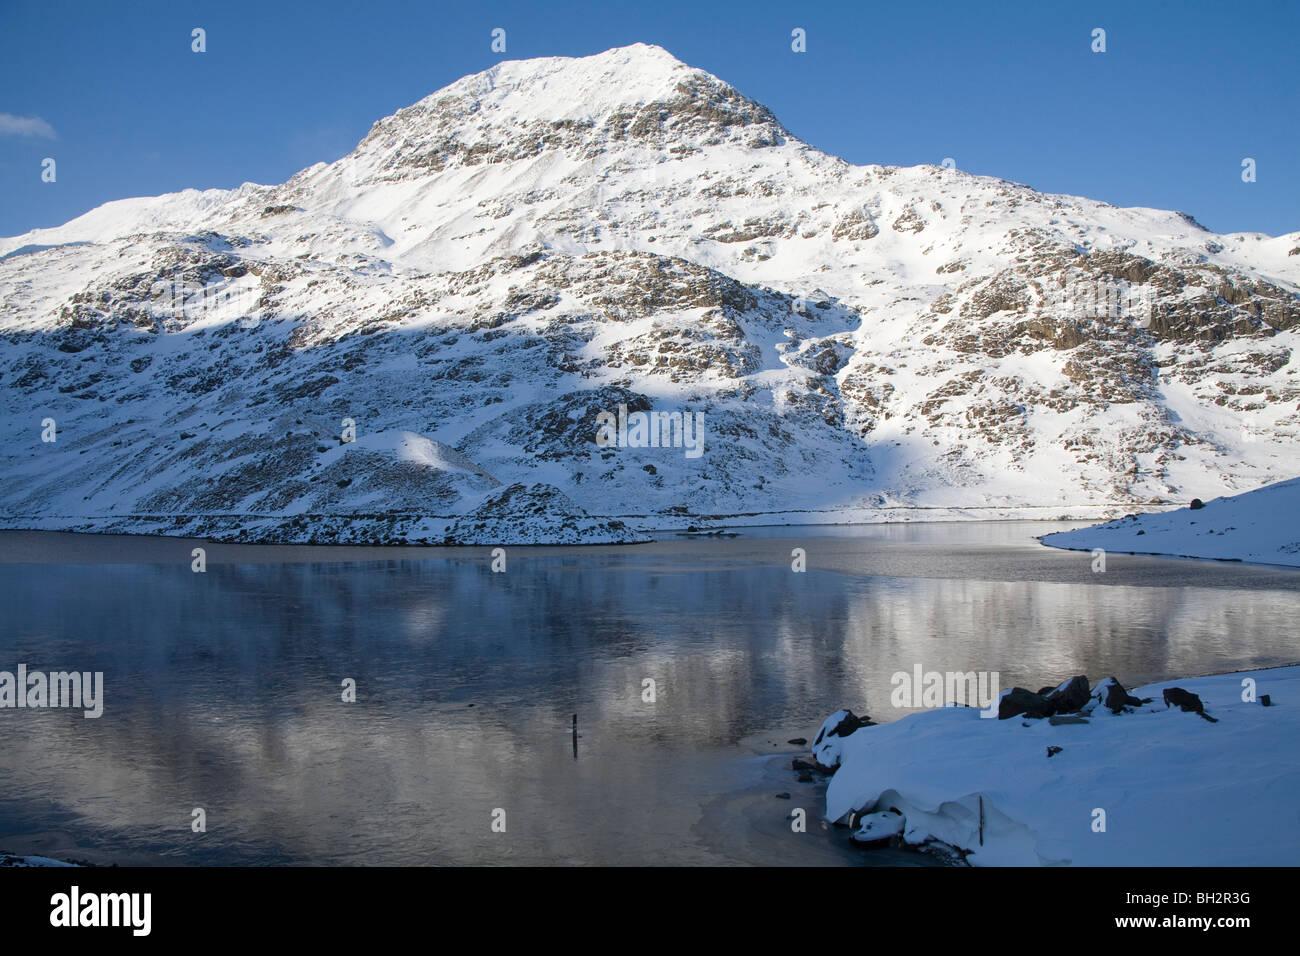 Gwynedd North Wales UK January Looking across Llyn Llydaw towards snow covered Crib Goch from Miners Track - Stock Image